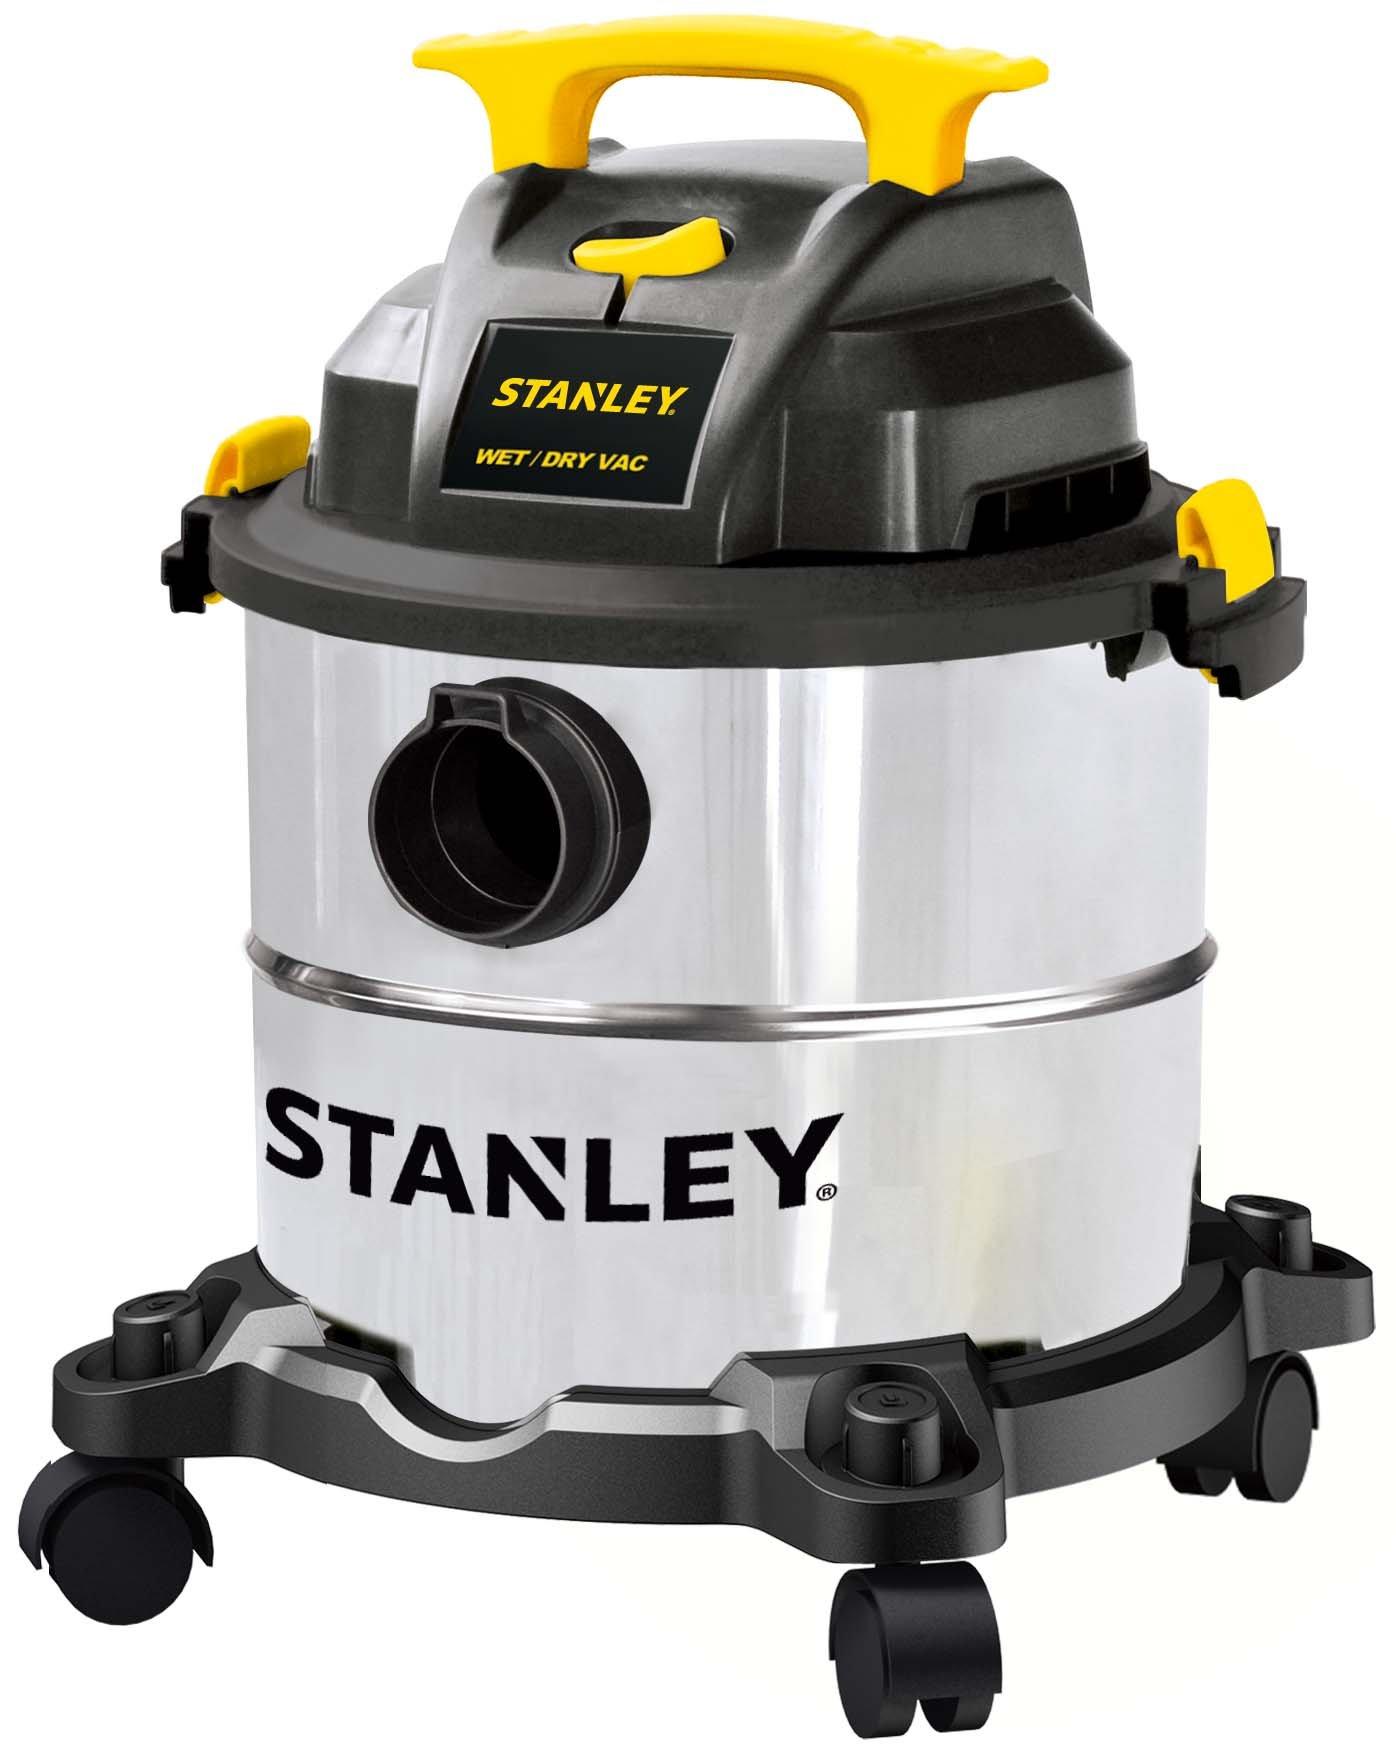 Stanley SL18115 Wet/Dry Wet Dry Vacuum Steel Tank, 5 gallon/4.0 HP/50''